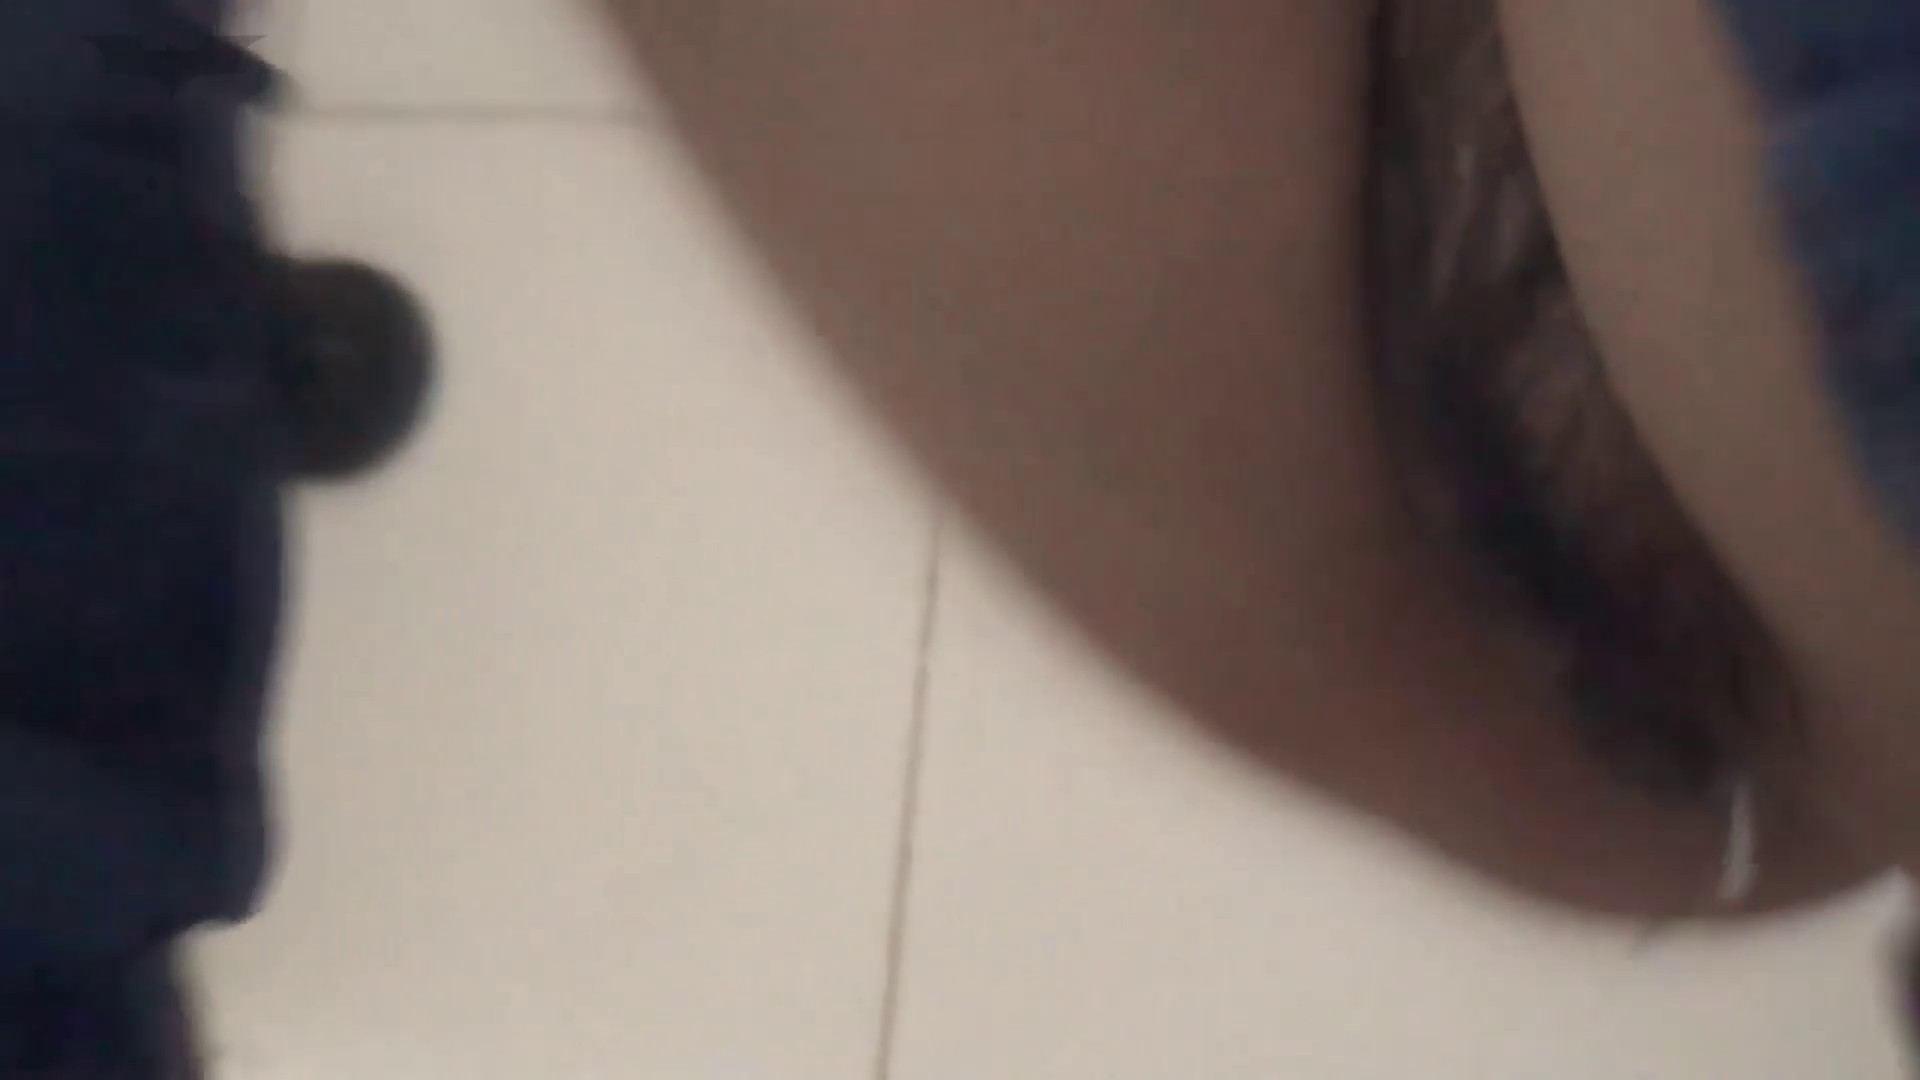 JD盗撮 美女の洗面所の秘密 Vol.14 美女 戯れ無修正画像 33画像 17